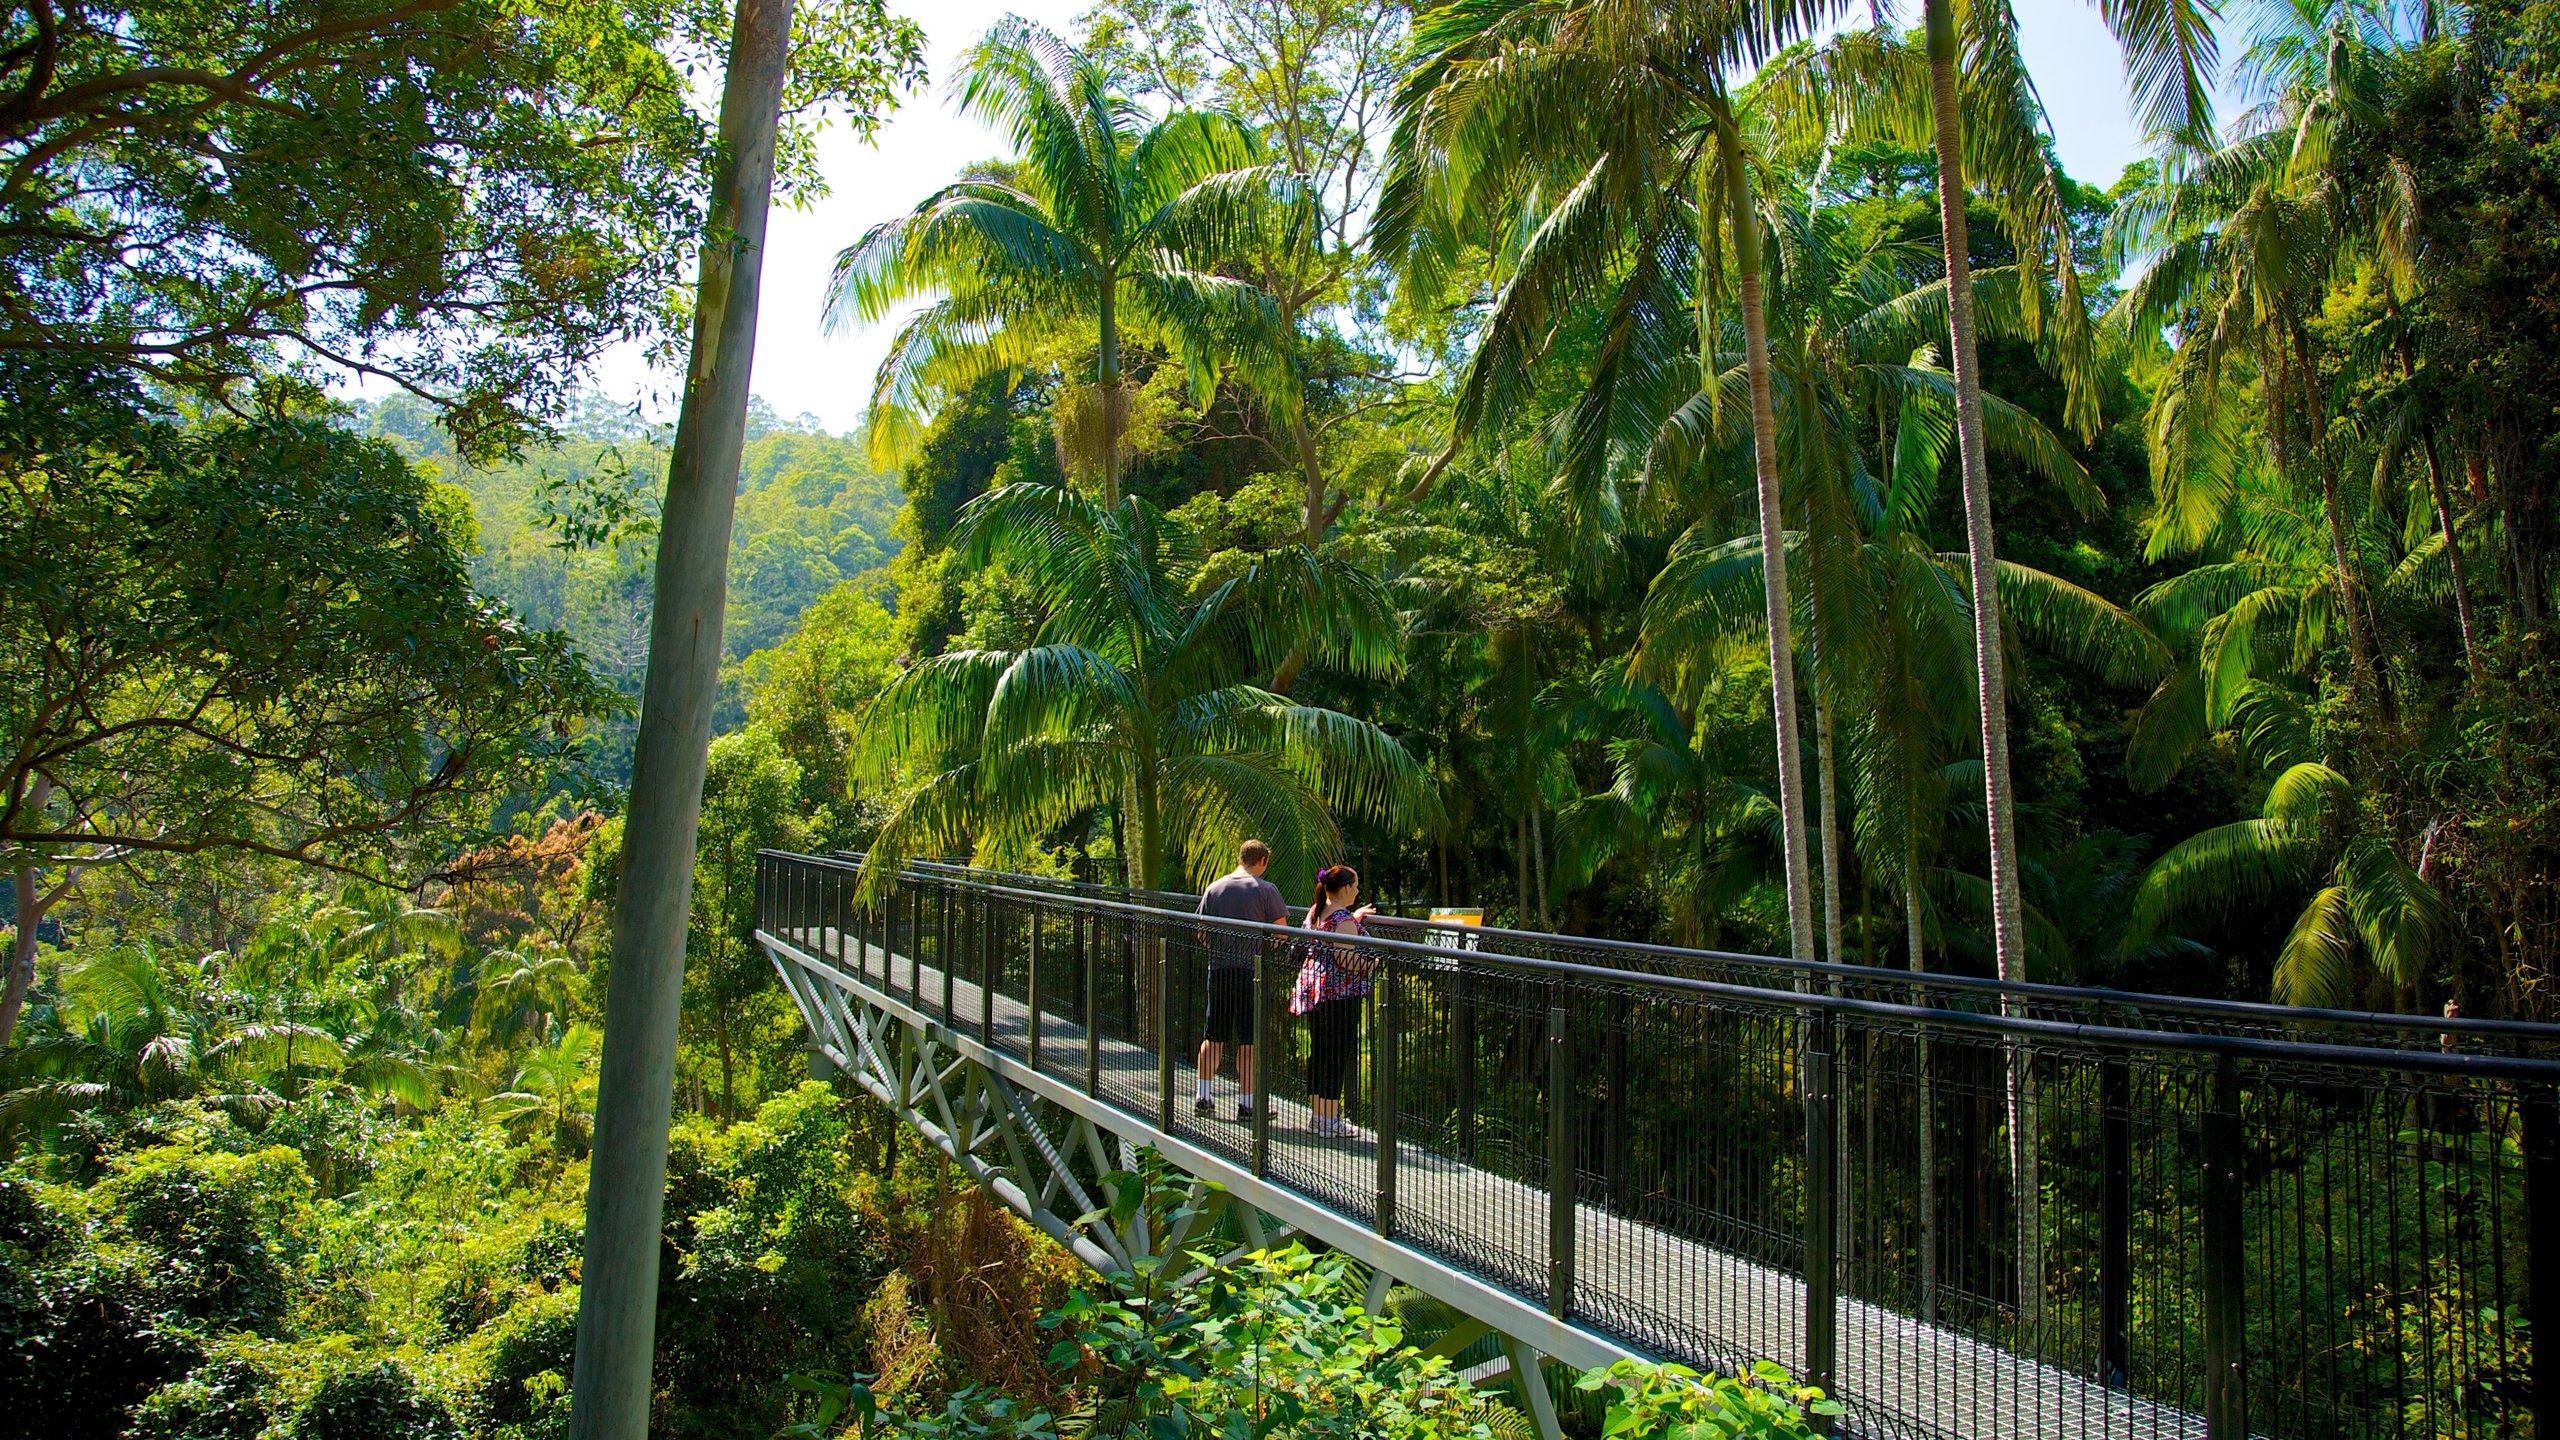 Gold Coast Hinterland, Queensland, Australia